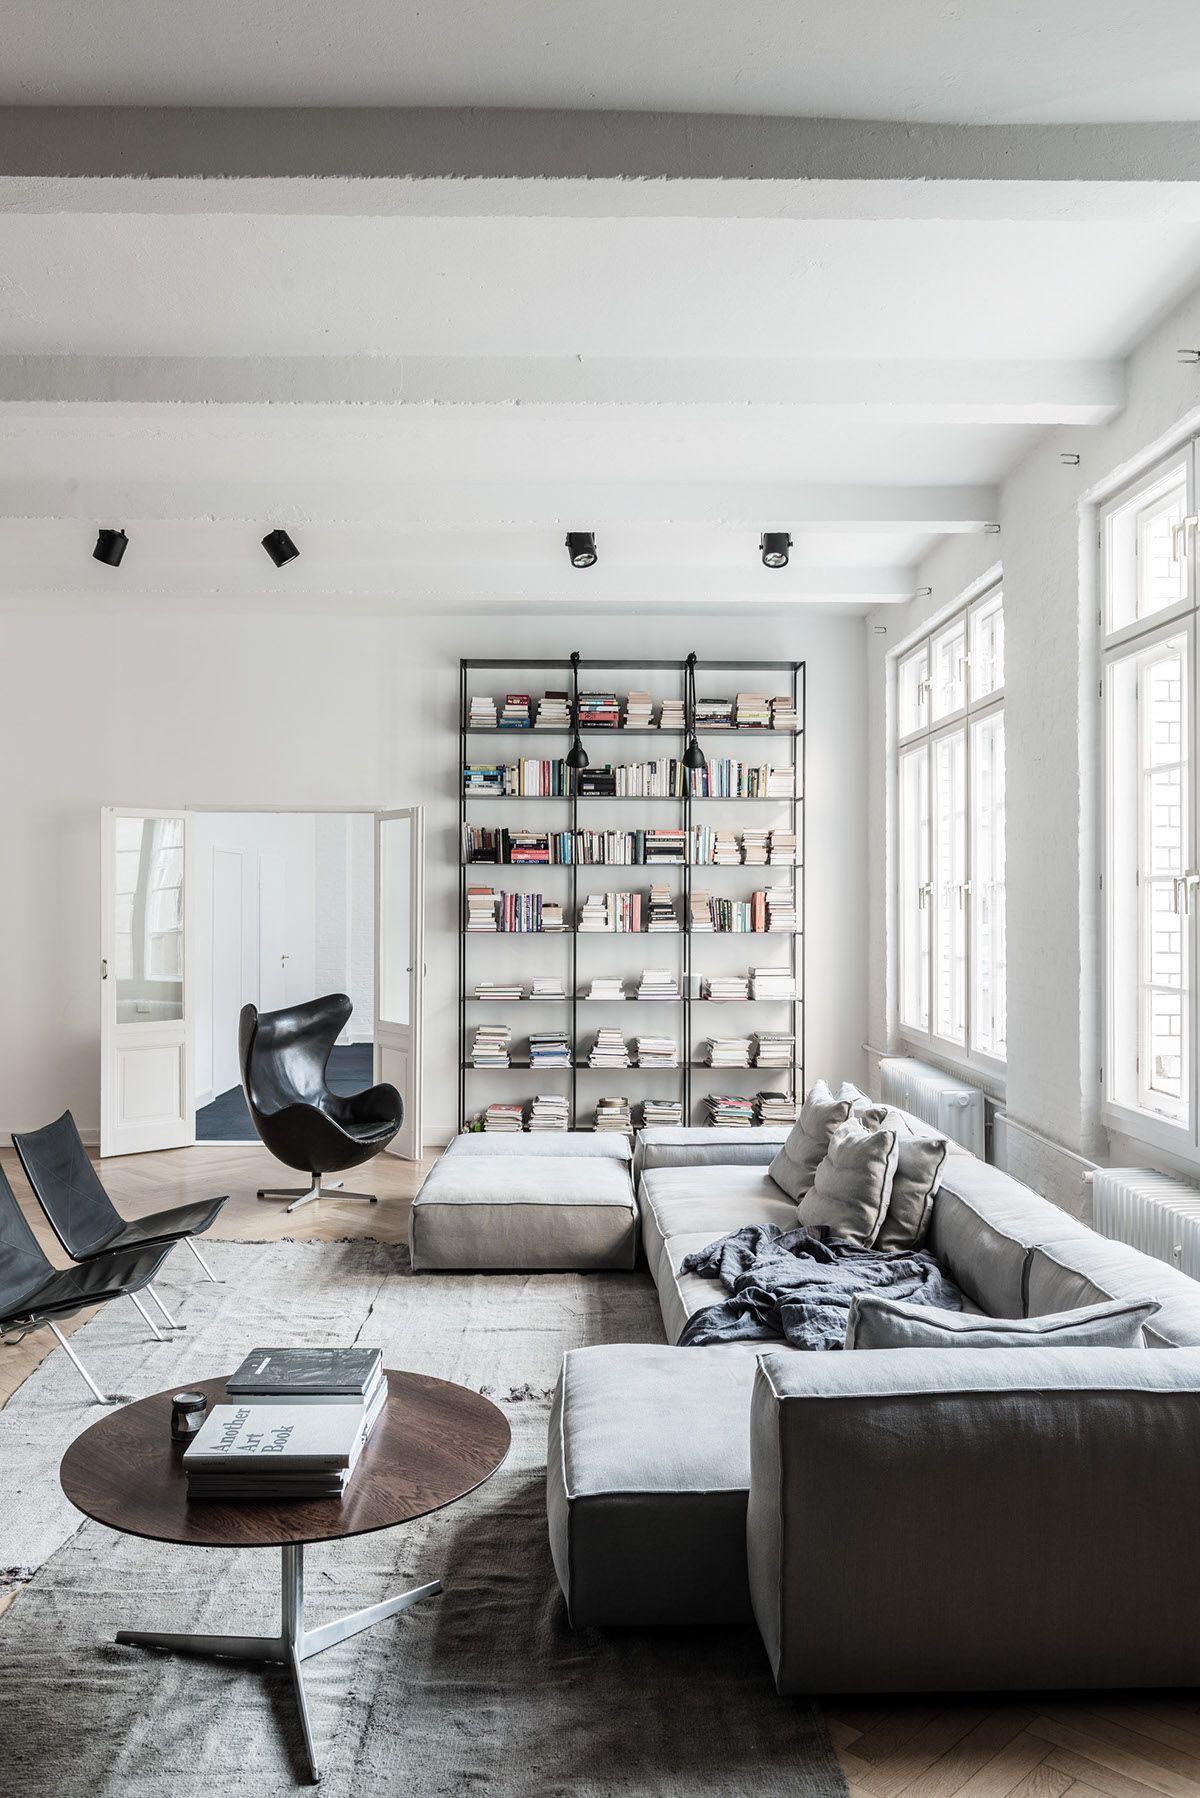 http://leibal.com/interiors/loft-apartment-studio/